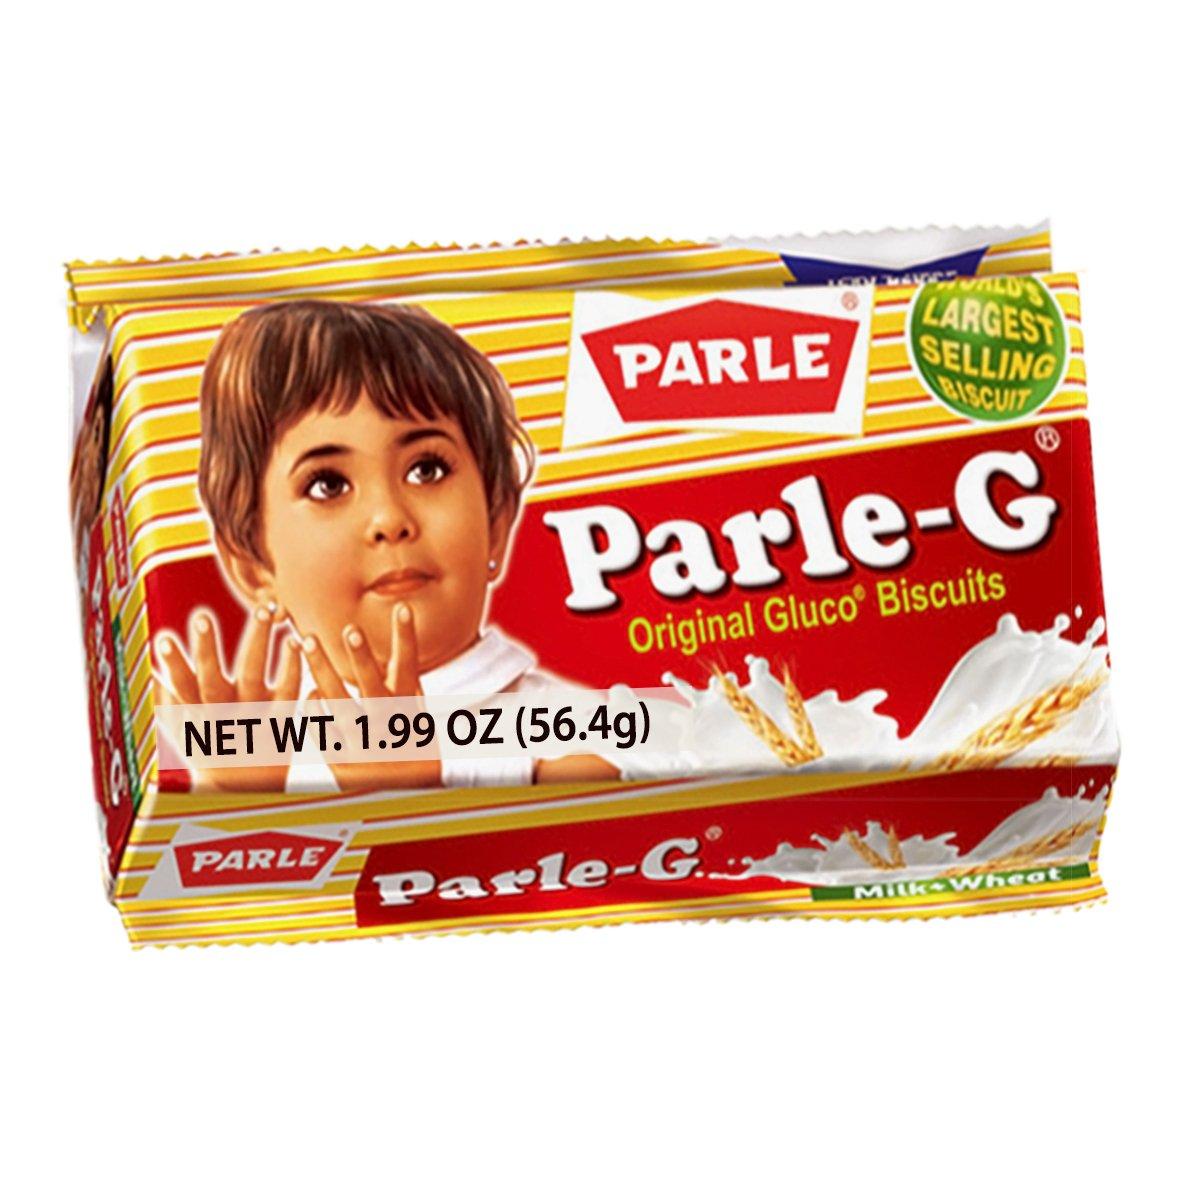 Parle-G Original Biscuits - 1.99 oz (6 Pack), Light Brown